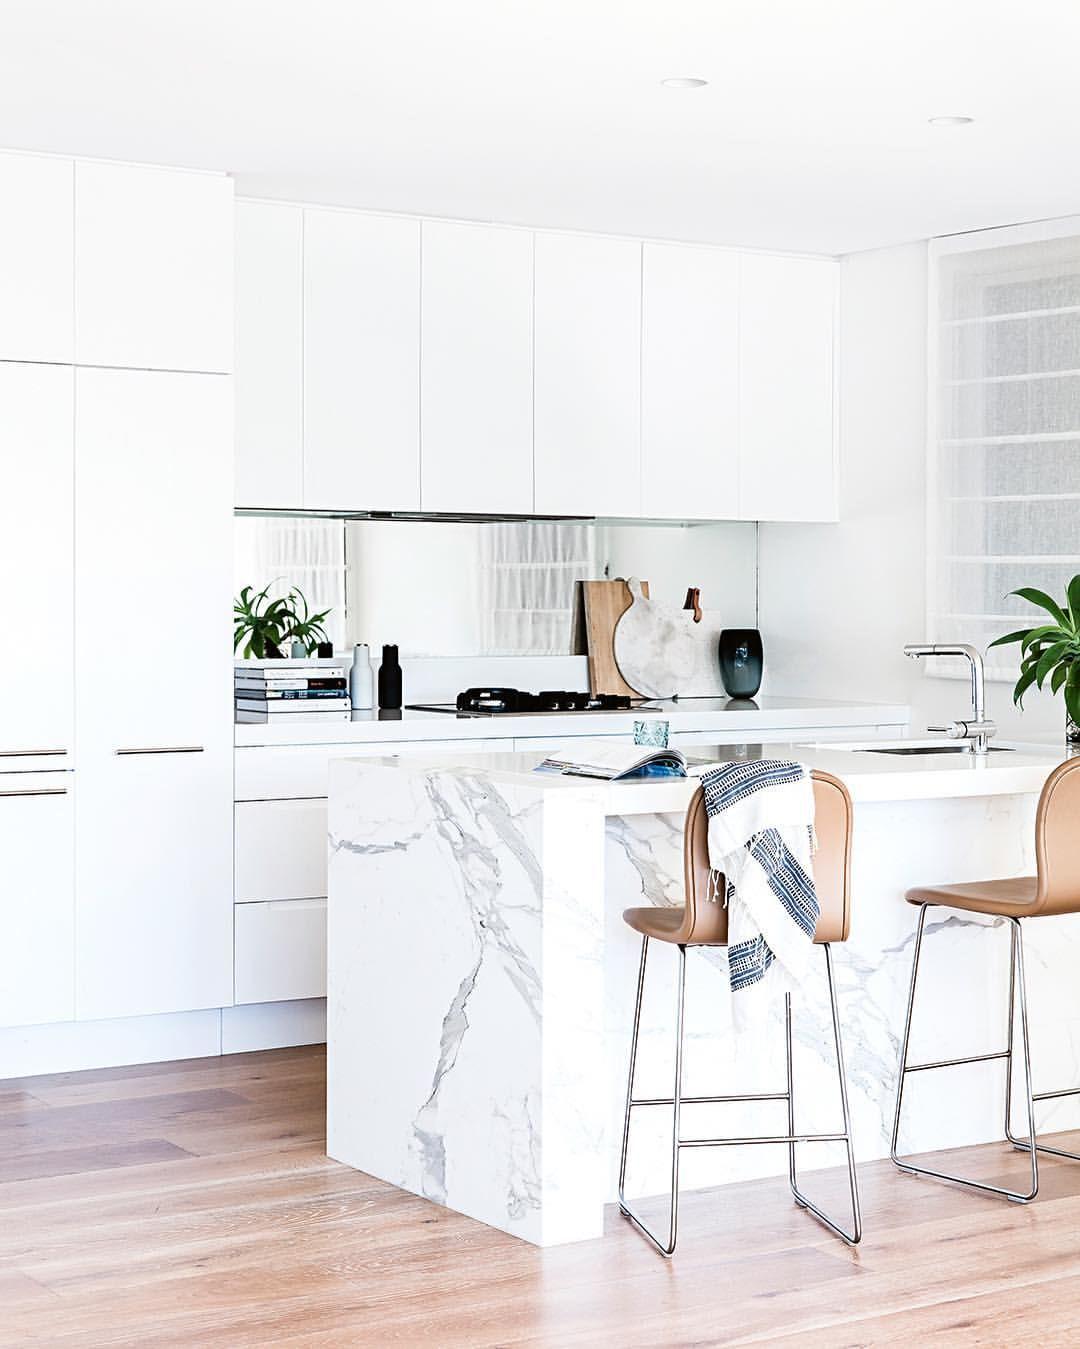 Carrara Marble Kitchen Benchtops: Consulta Esta Foto De Instagram De @insideoutmag • 2,678 Me Gusta